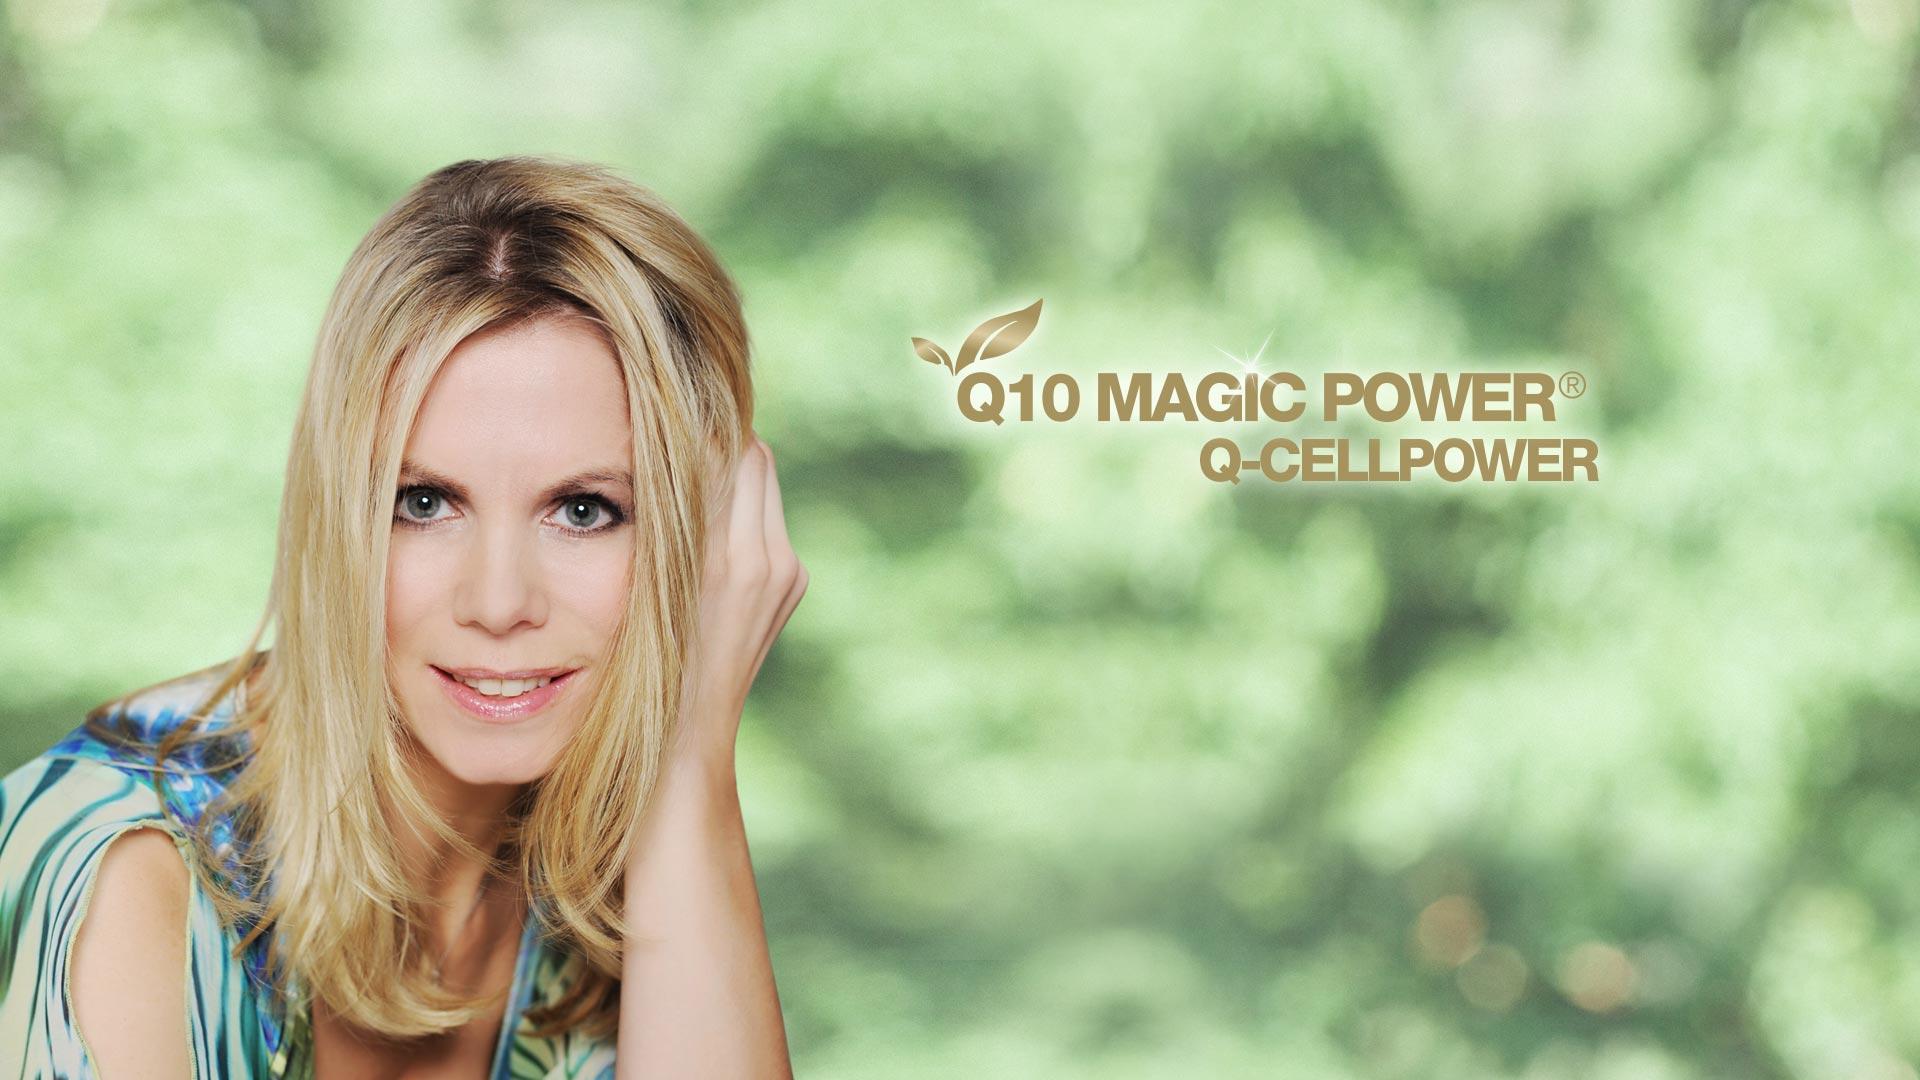 Q10 Magic Power® Q-Cellpower® Kosmetik und Nahrungsergänzung